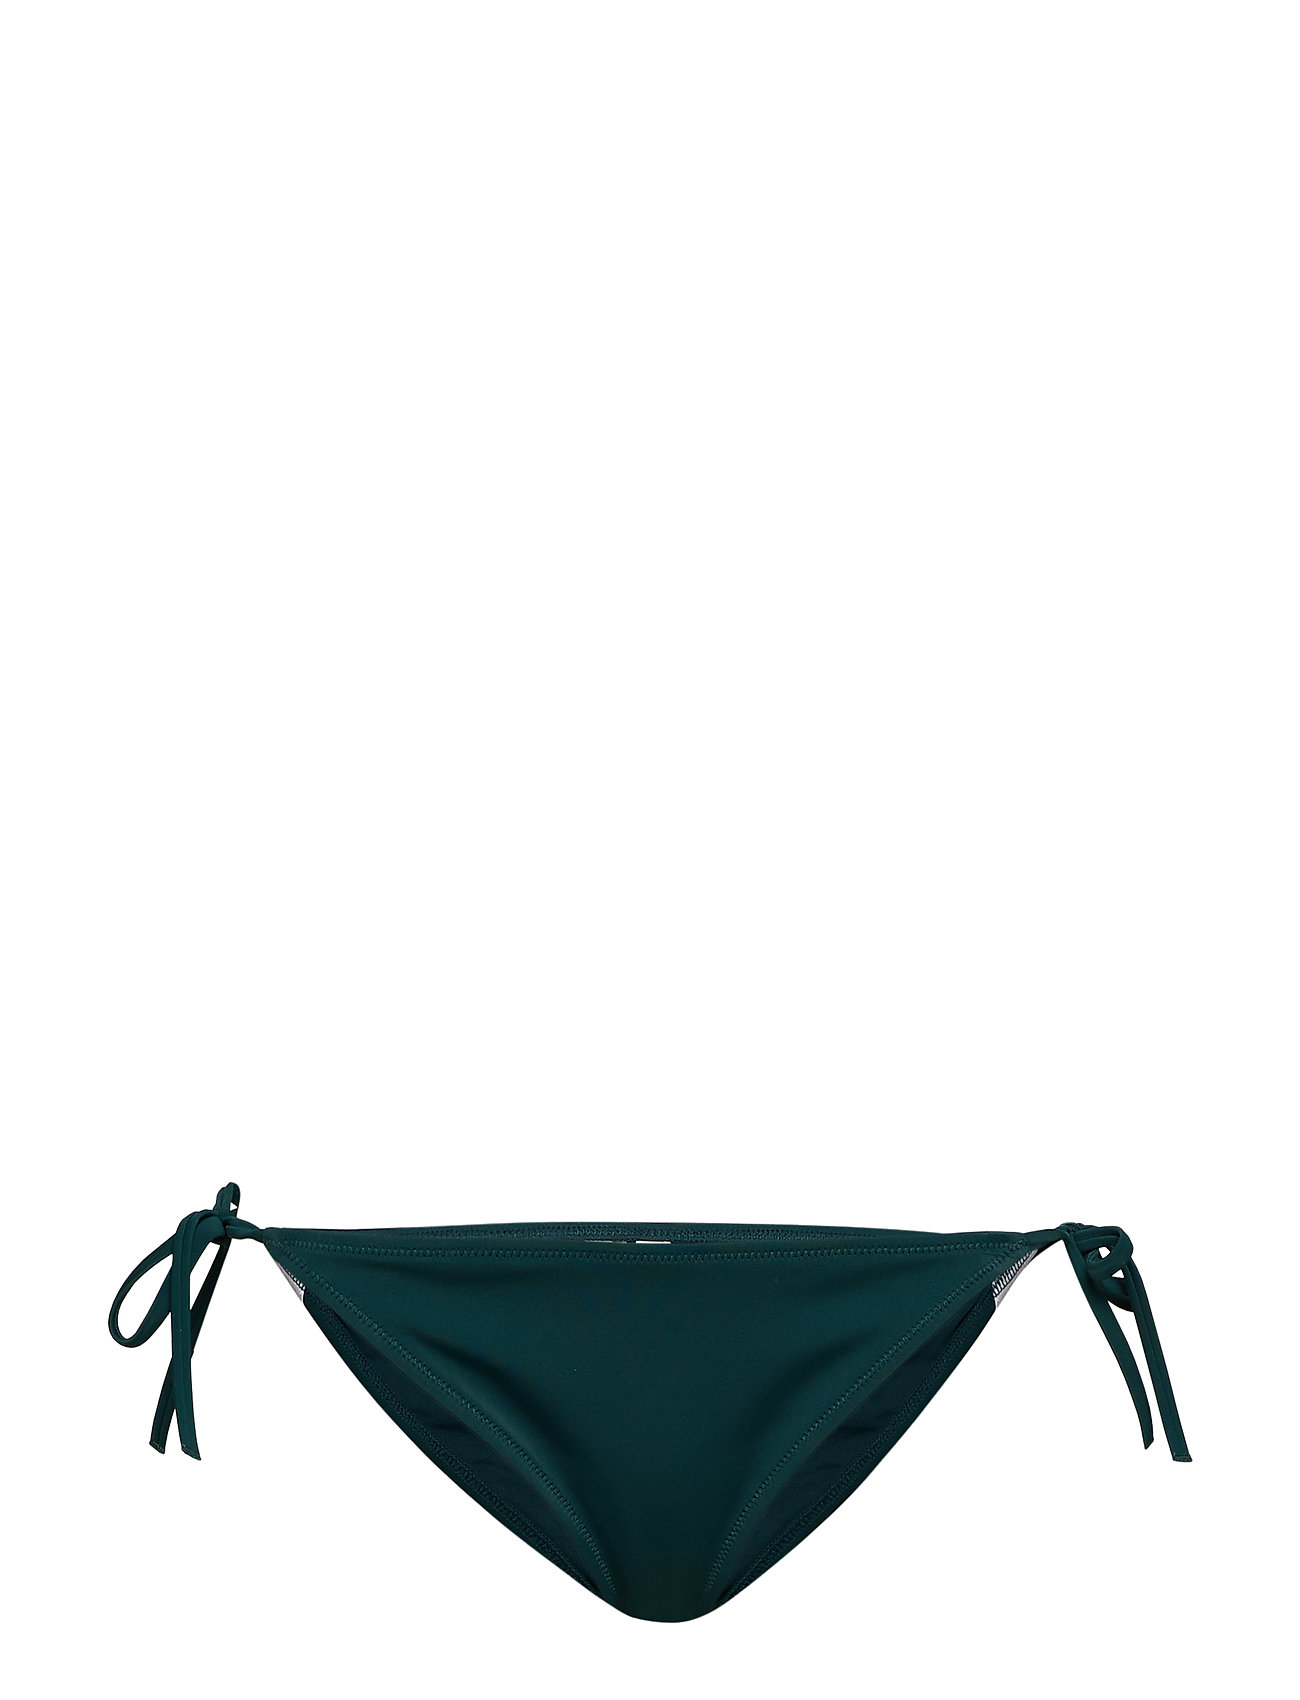 Calvin Klein CHEEKY STRING SIDE T - PONDAROSA PINE